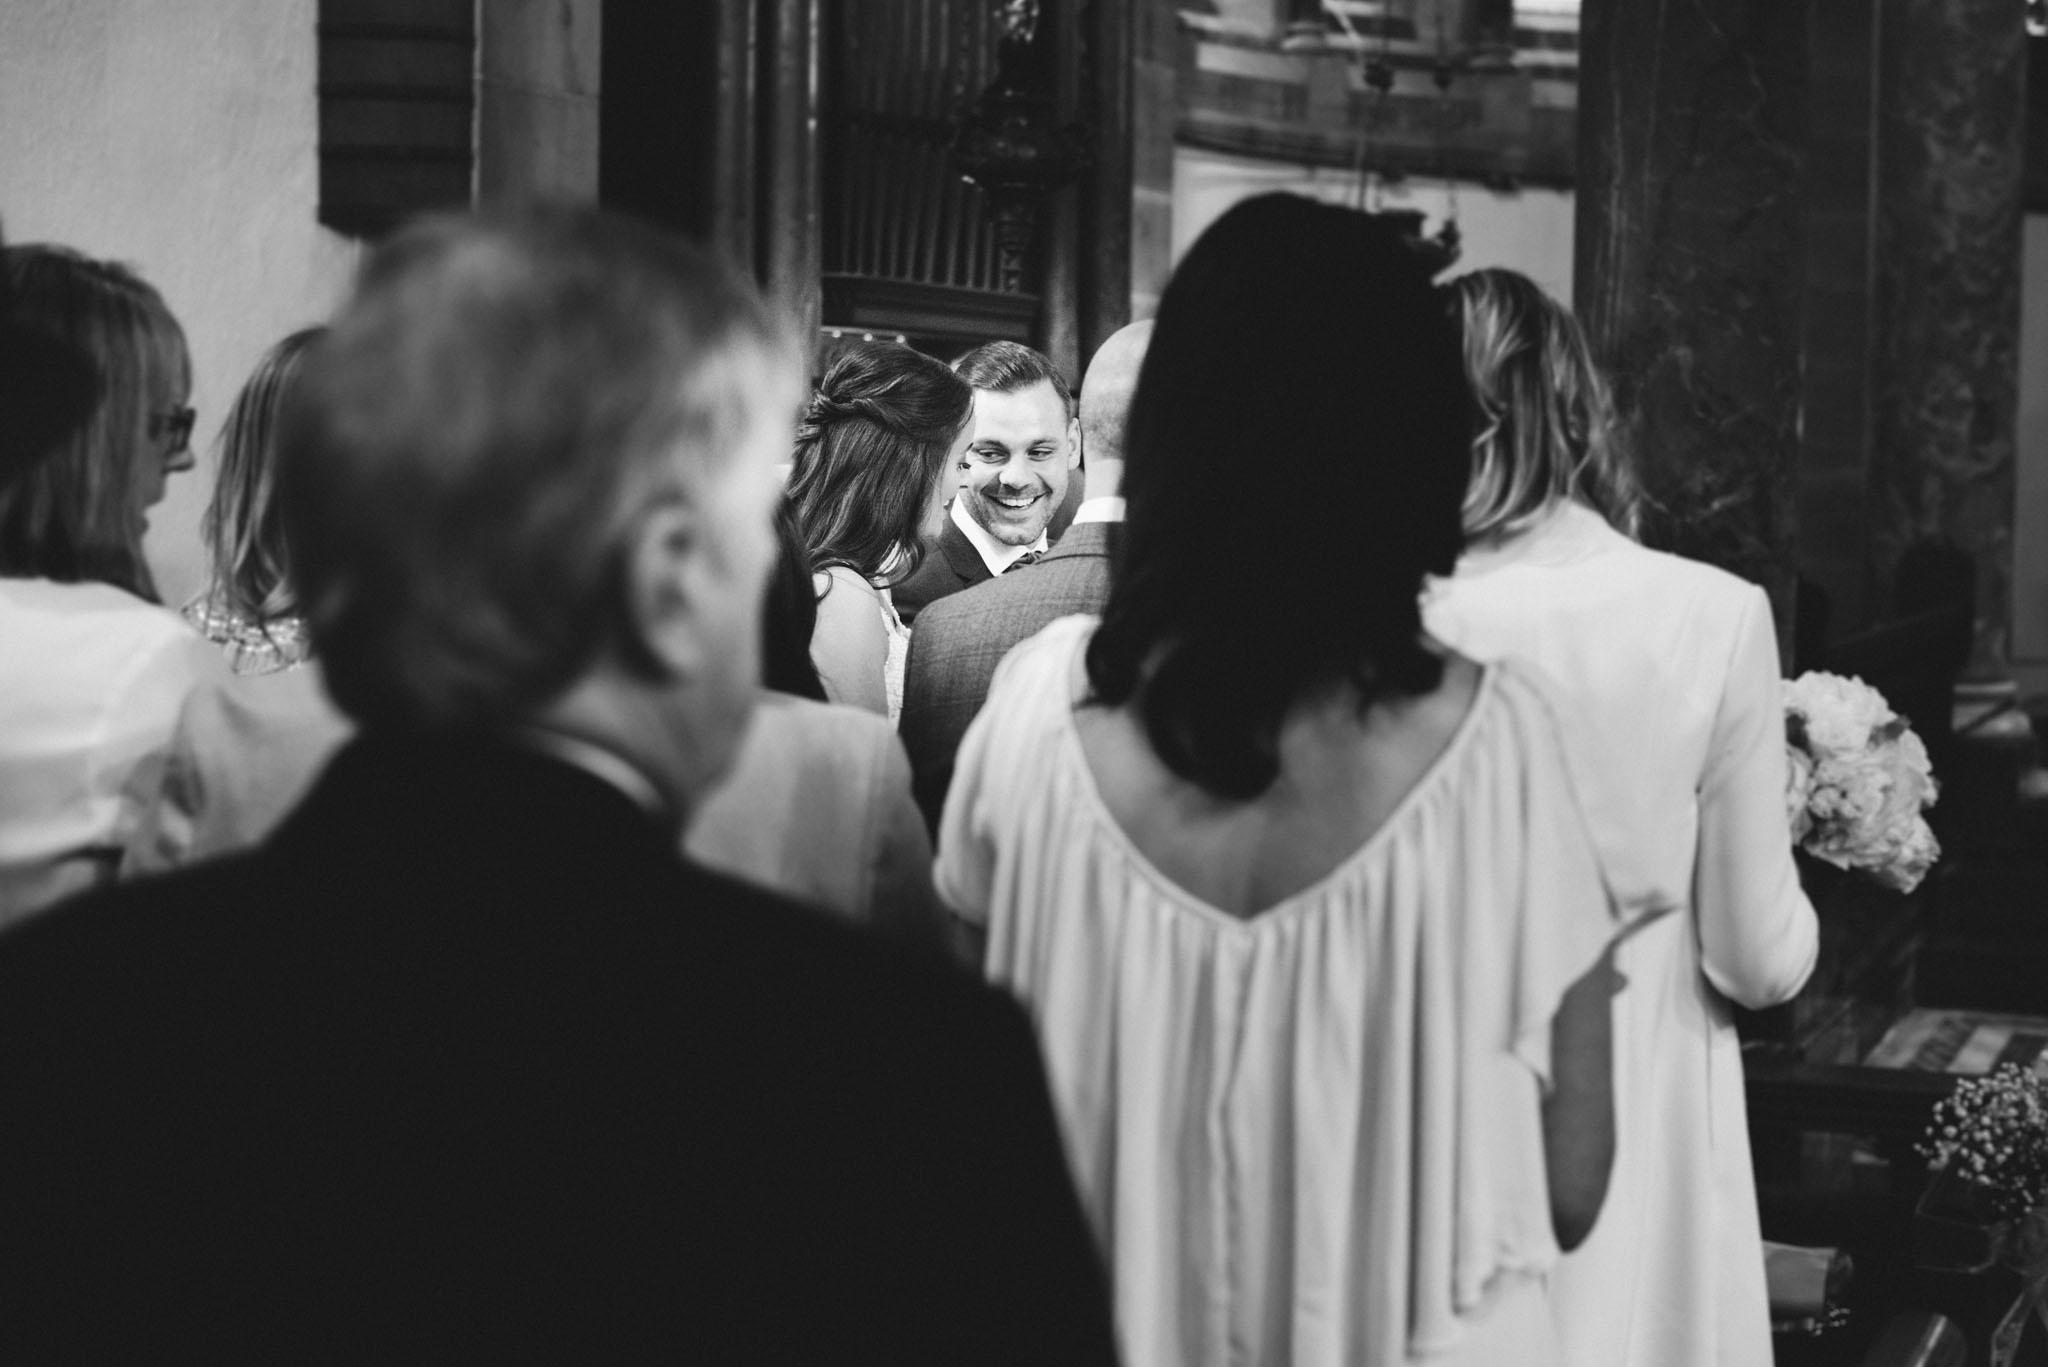 wedding-photographer-glewstone-court-hereford-scott-stockwell-photography220.jpg